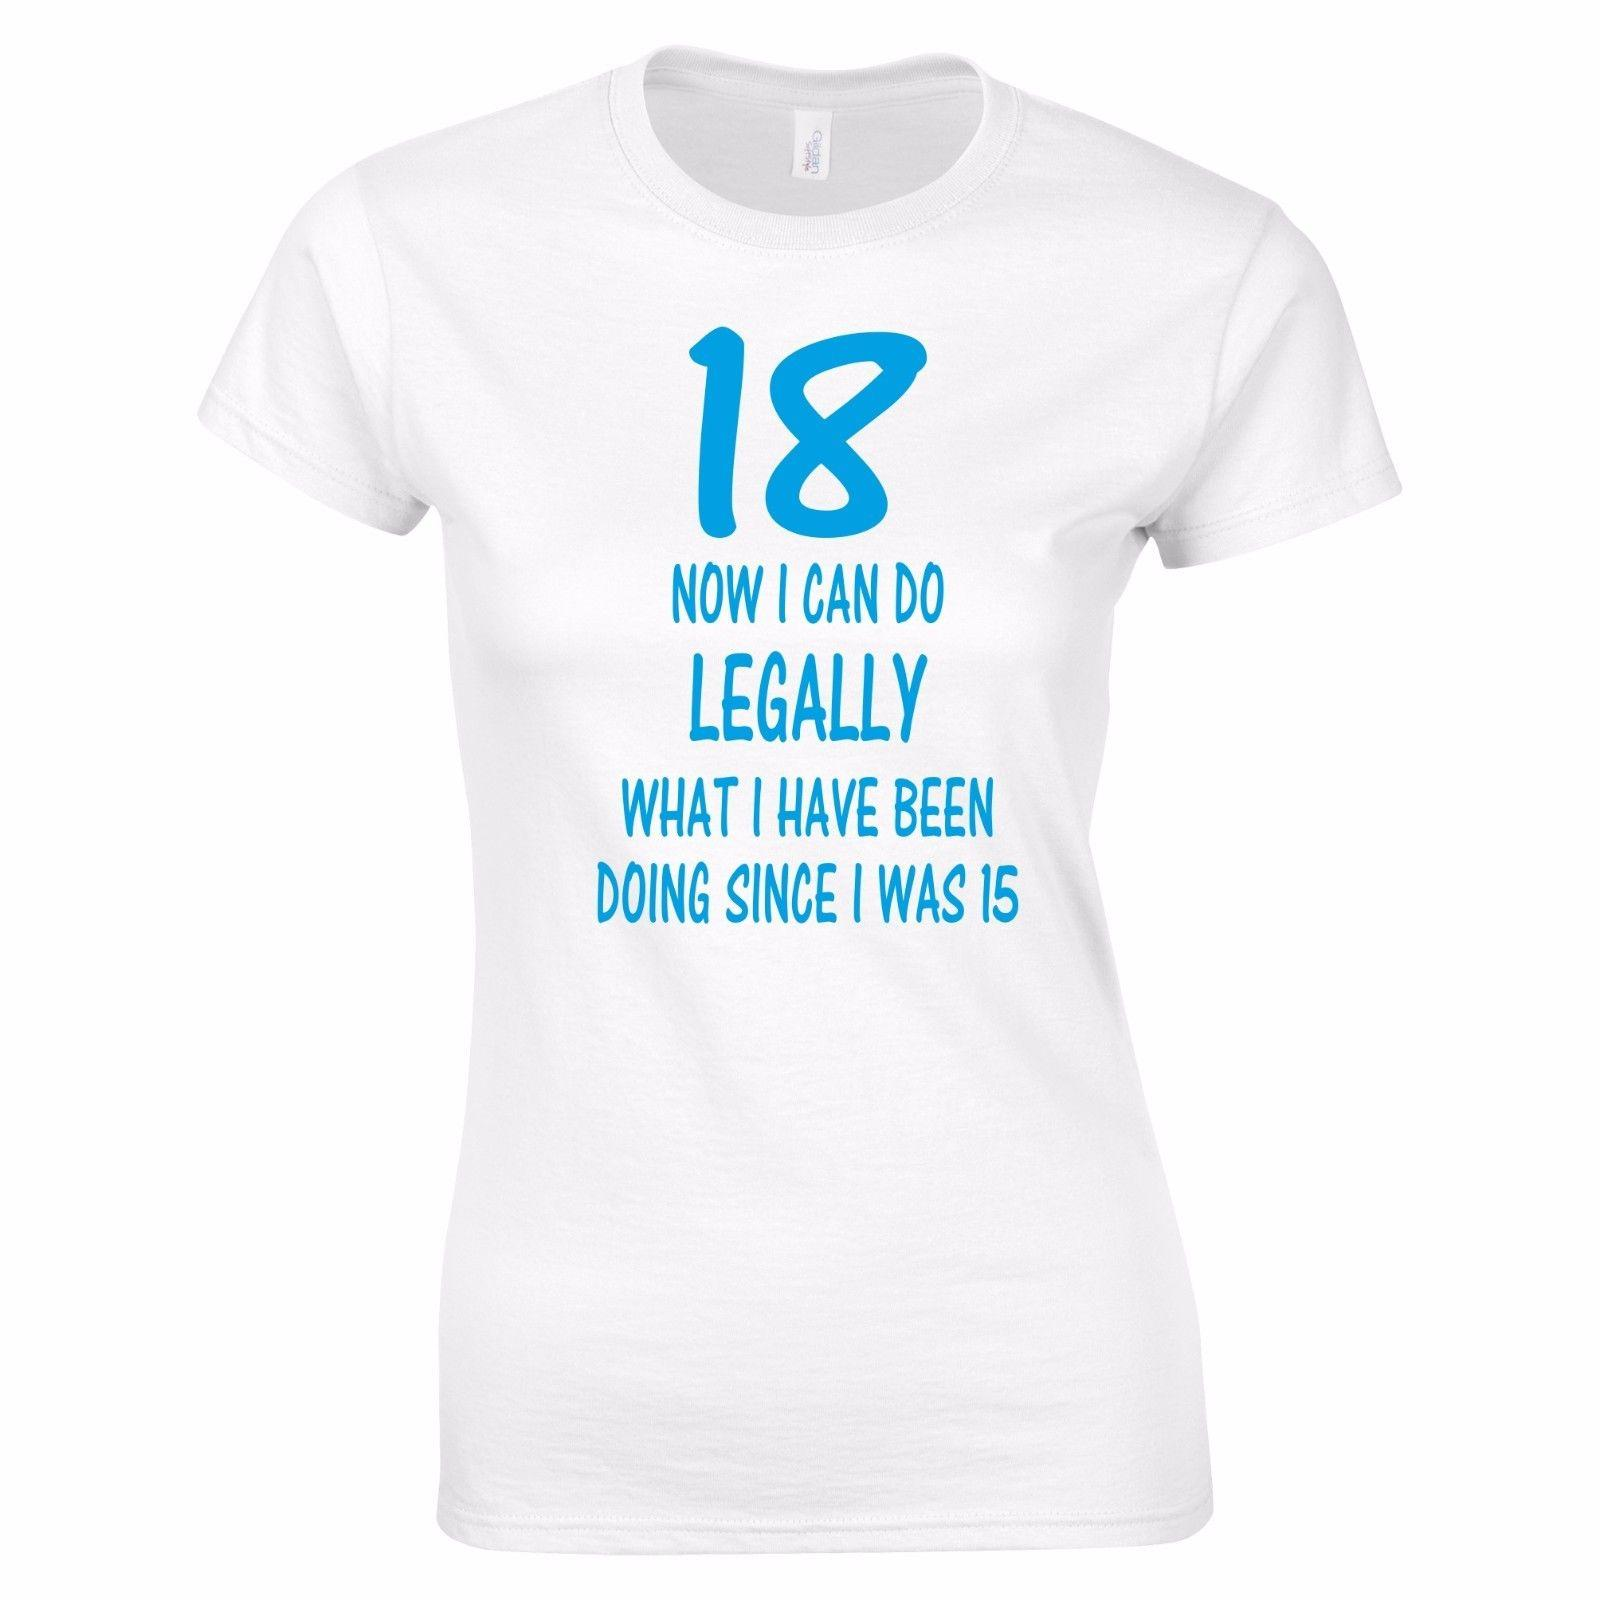 4151e824e 18 And Legal 18th Birthday Funny Tee T Shirt Top Tumblr Gift Xmas Secret  Santa Funny Unisex Casual Tshirt Tee Shirt Designs Humorous T Shirts From  ...